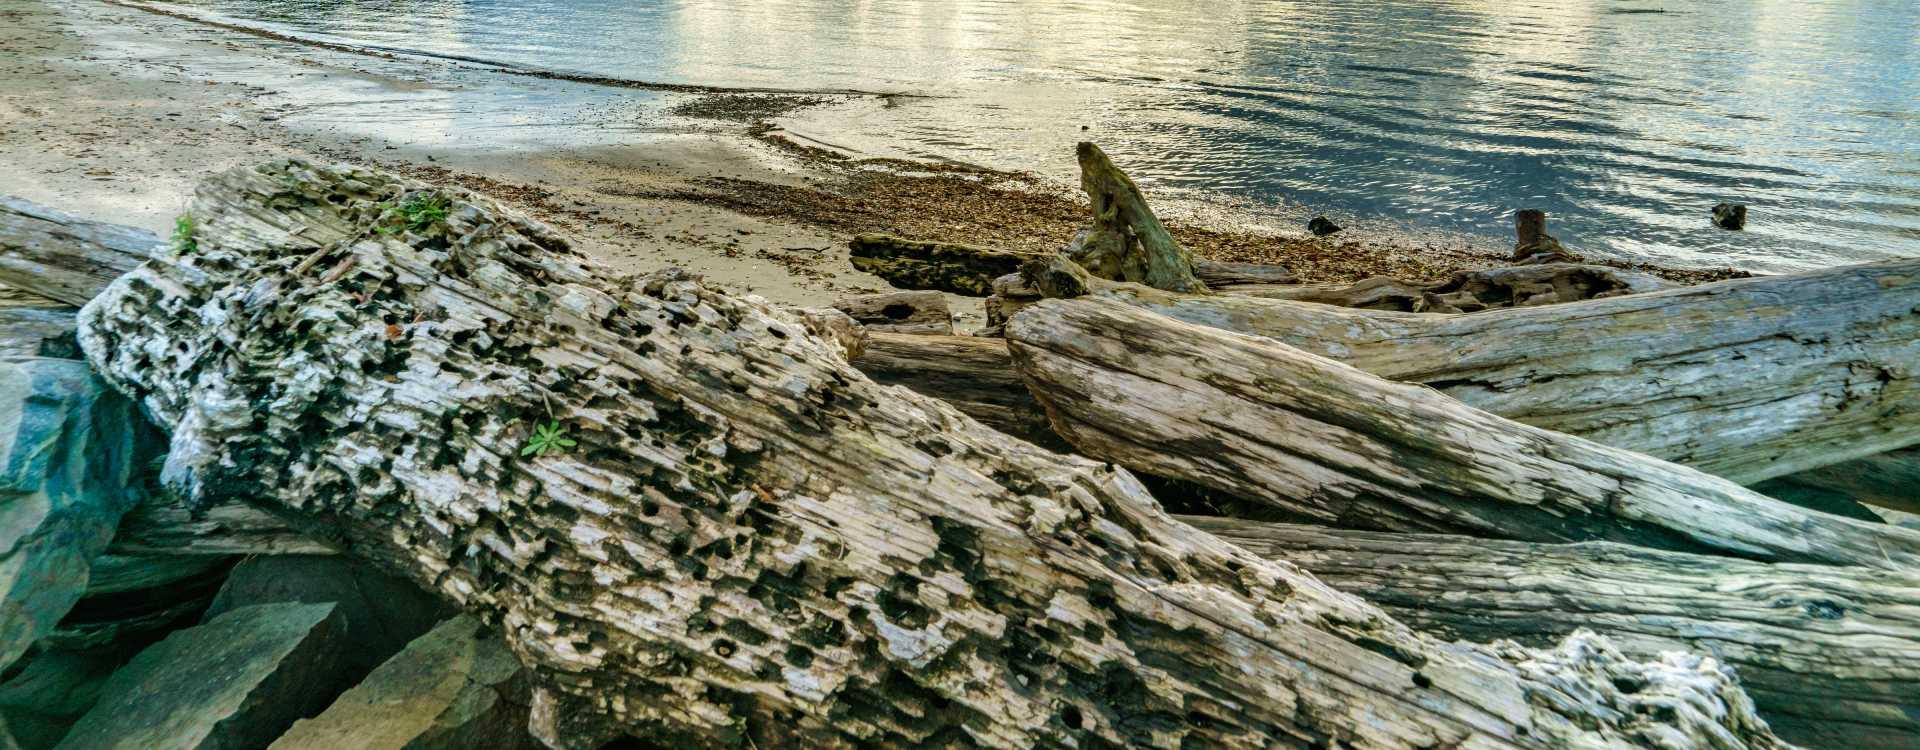 Saltwater-State-Park